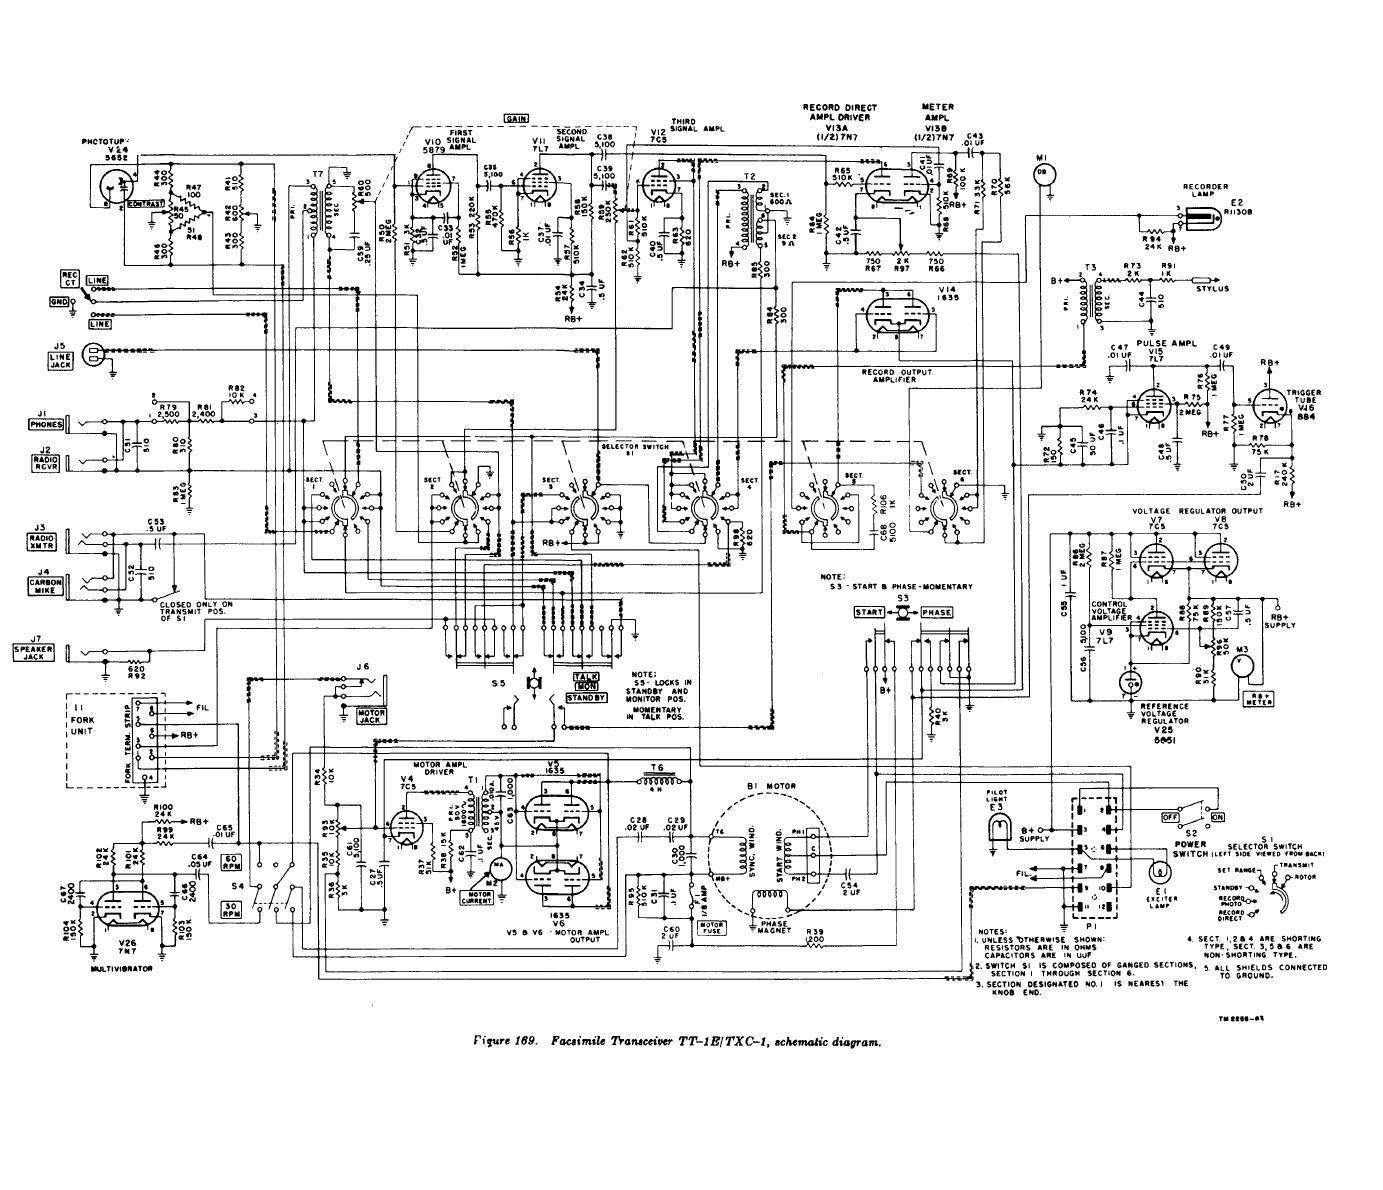 Figure 169 Facsimile Transceiver Tt 1b Txc 1 Schematic Diagram Circuit Privacy Statement Press Release